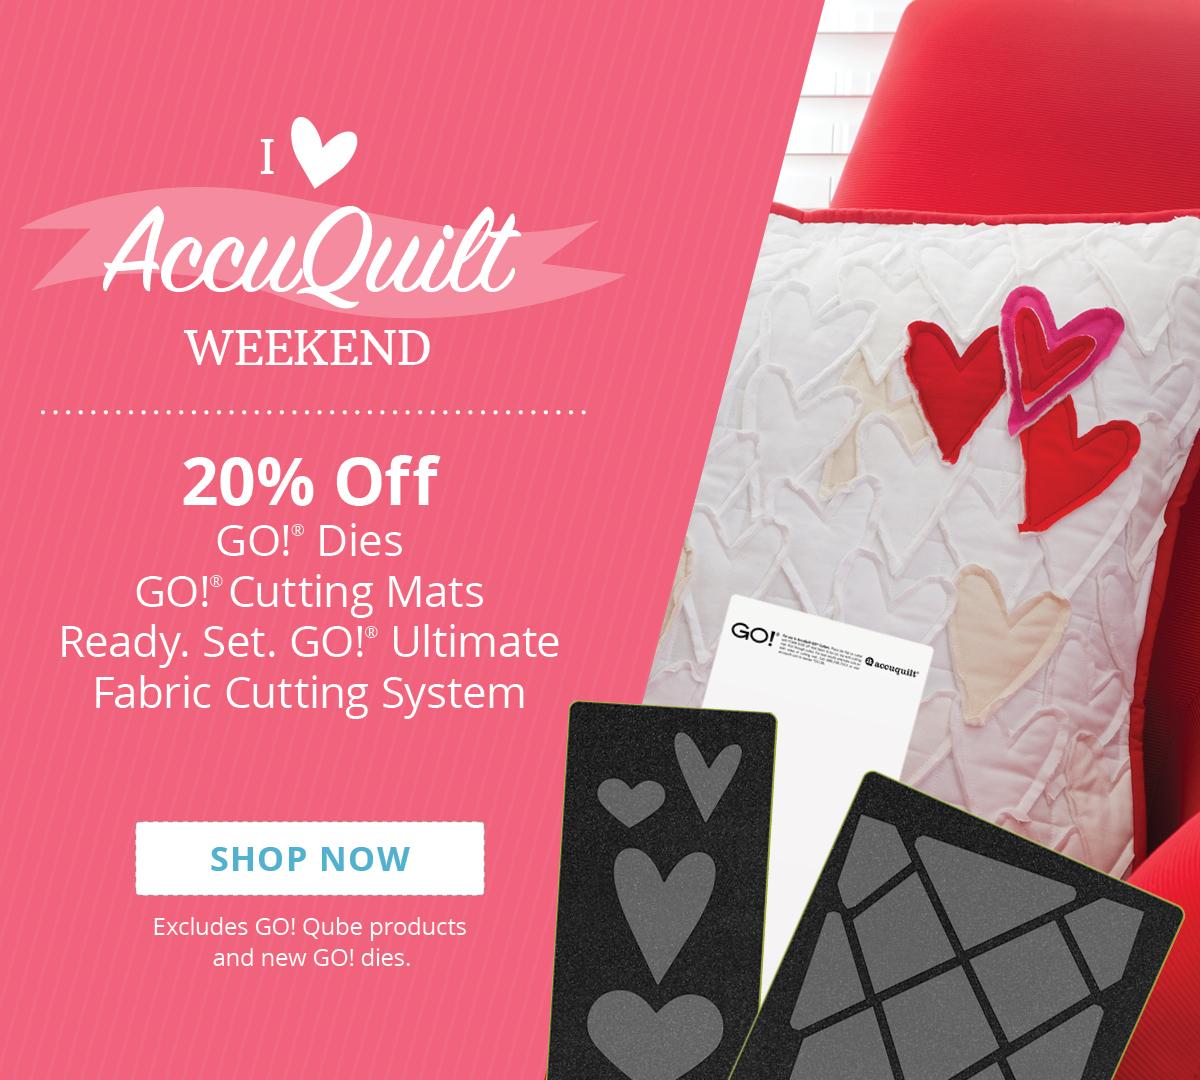 20% Off GO! Dies, GO! Cutting Mats & Ready. Set. GO! | Shop Now >